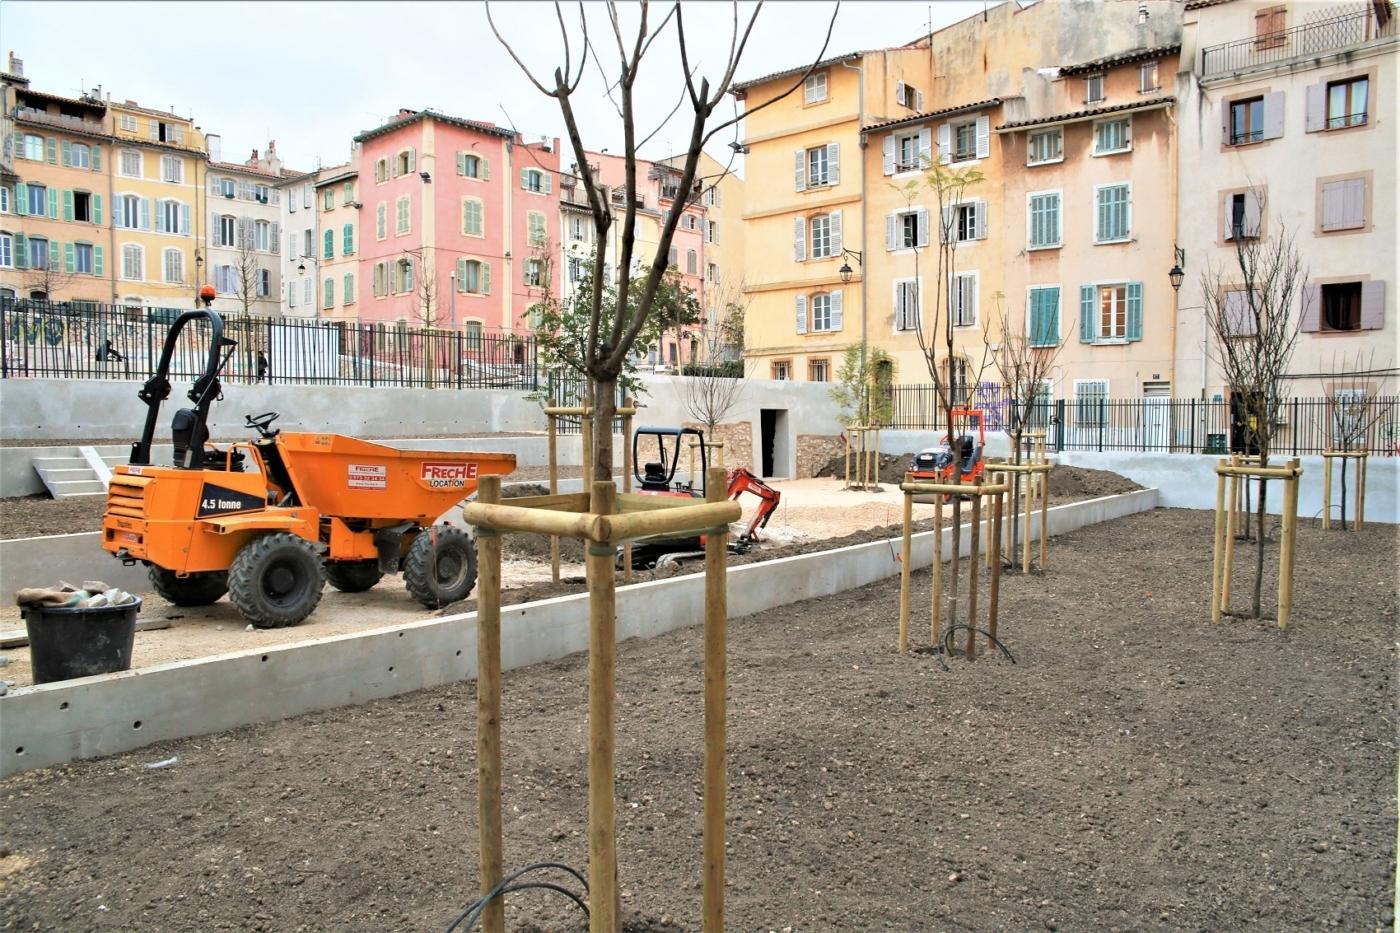 , Le jardin partagé du Panier ouvre ses portes, Made in Marseille, Made in Marseille